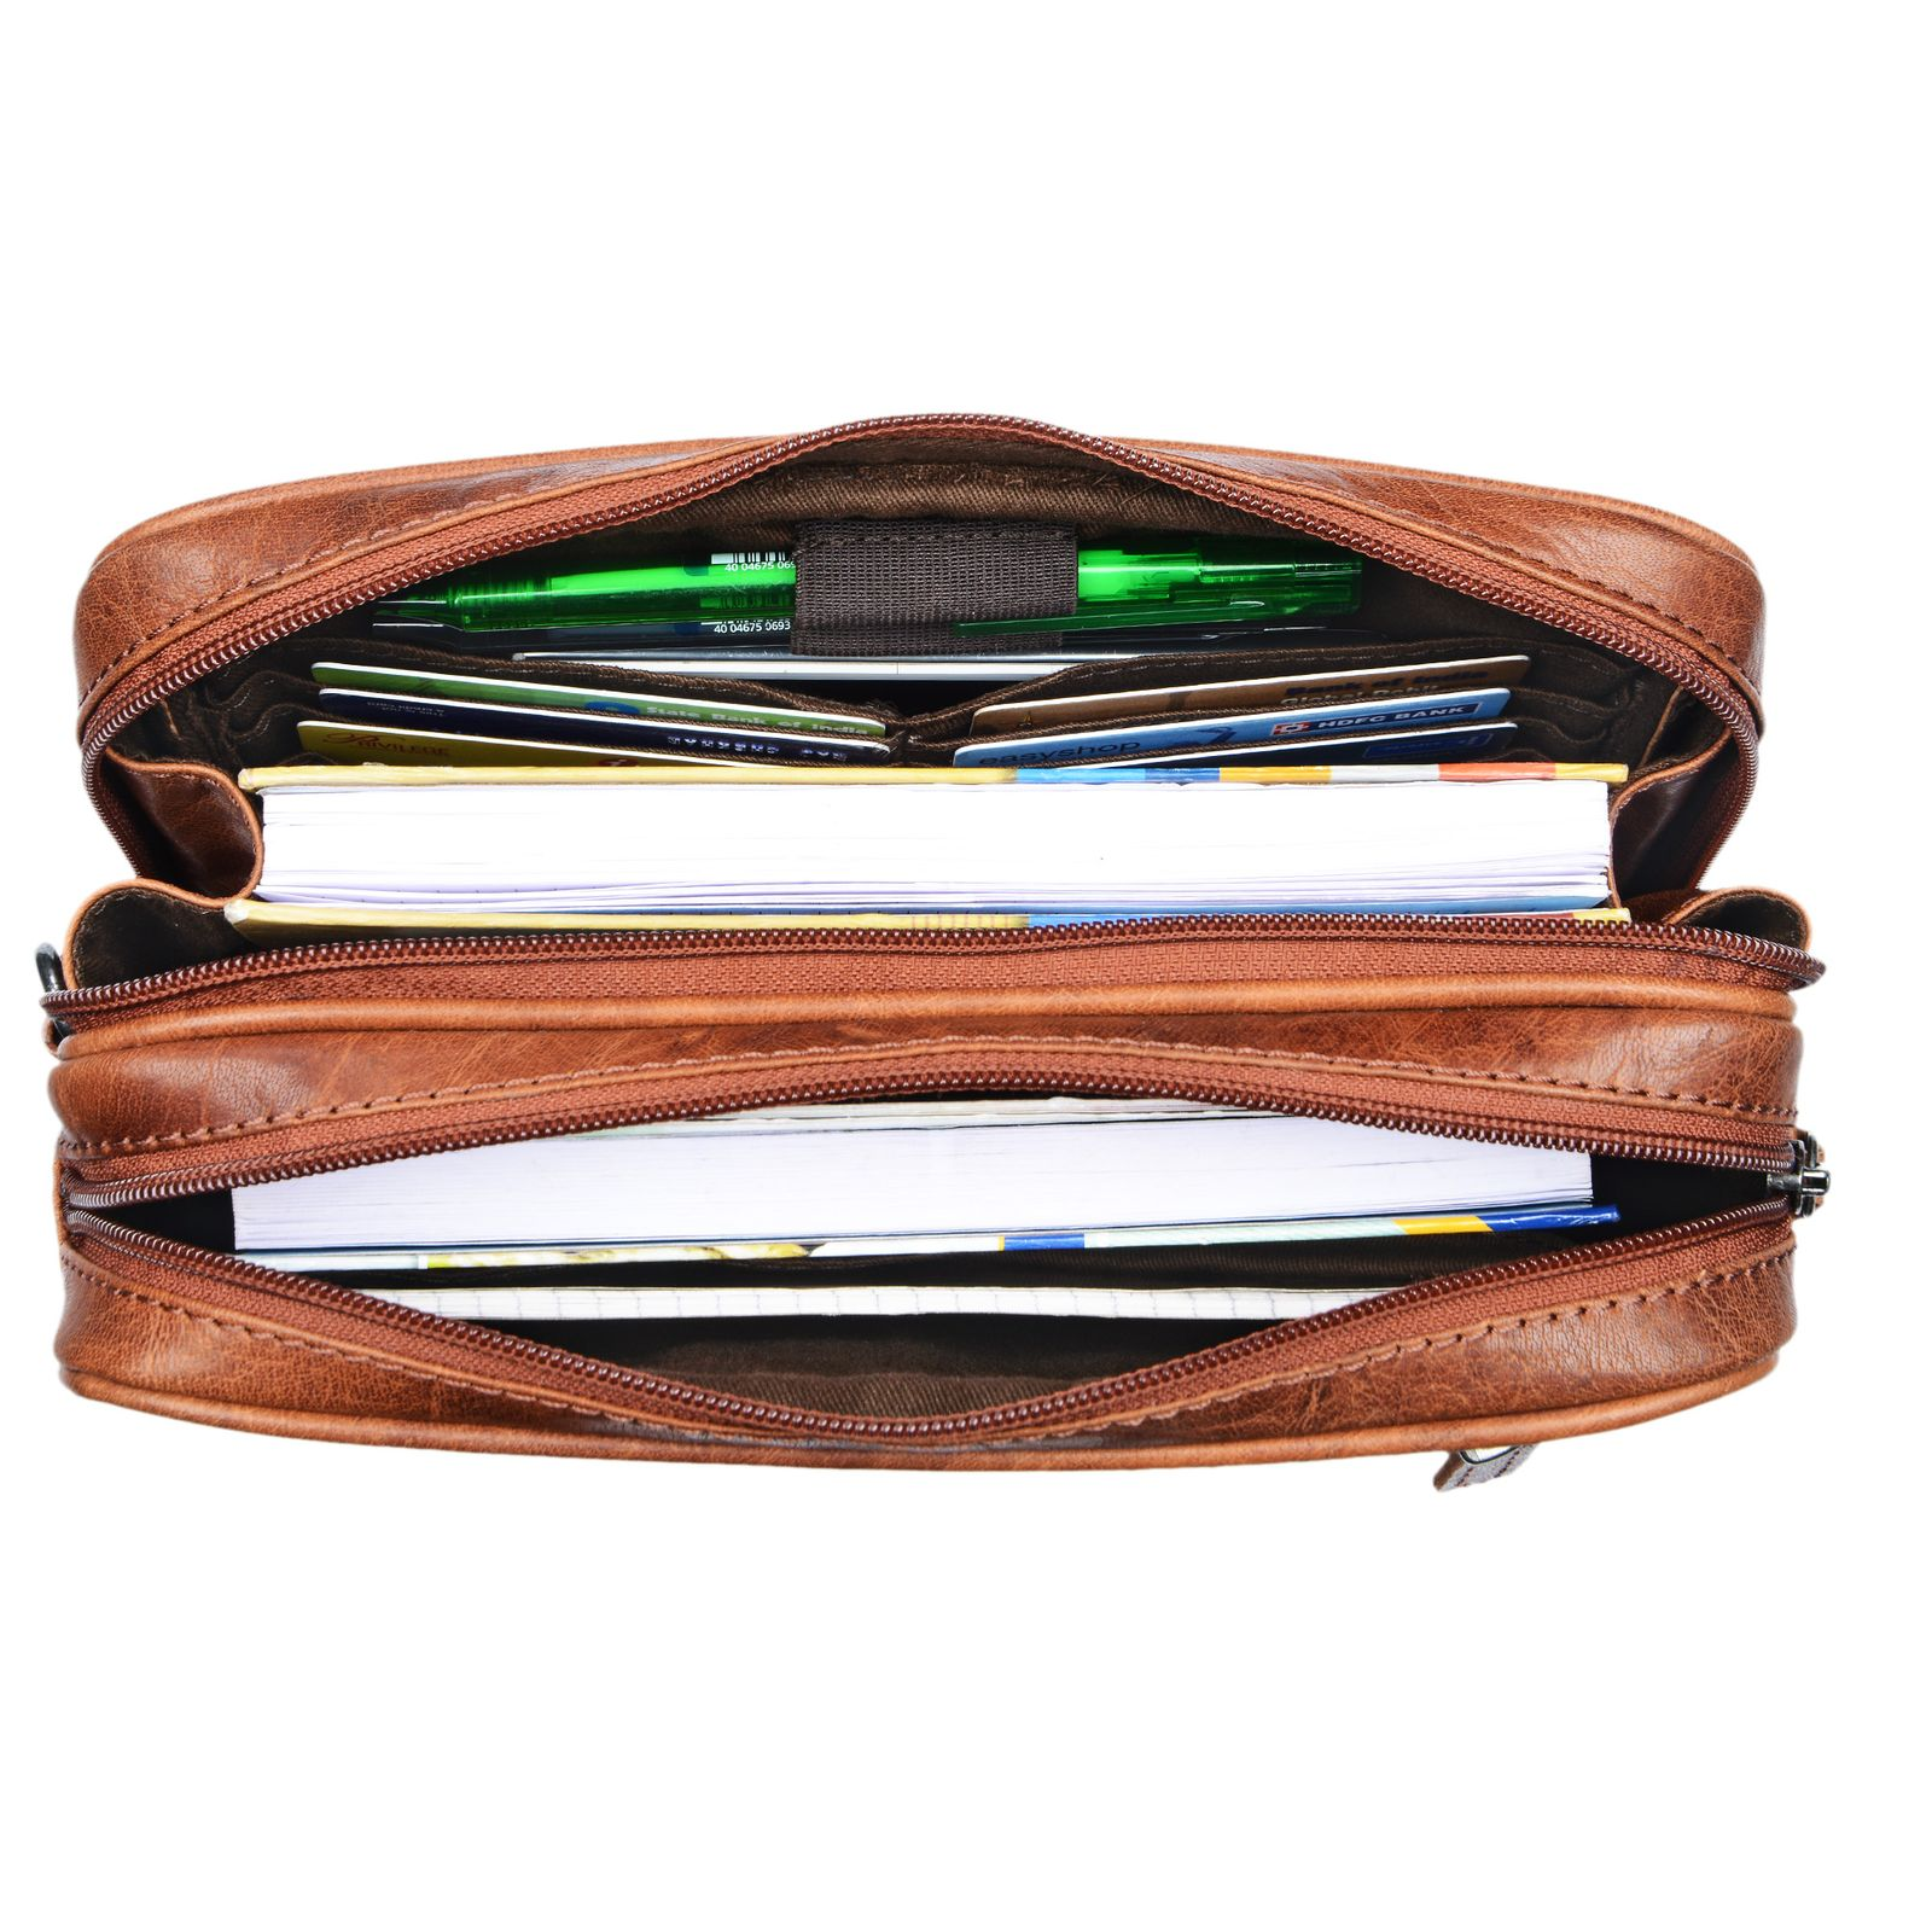 Handtasche Leder für Tablet